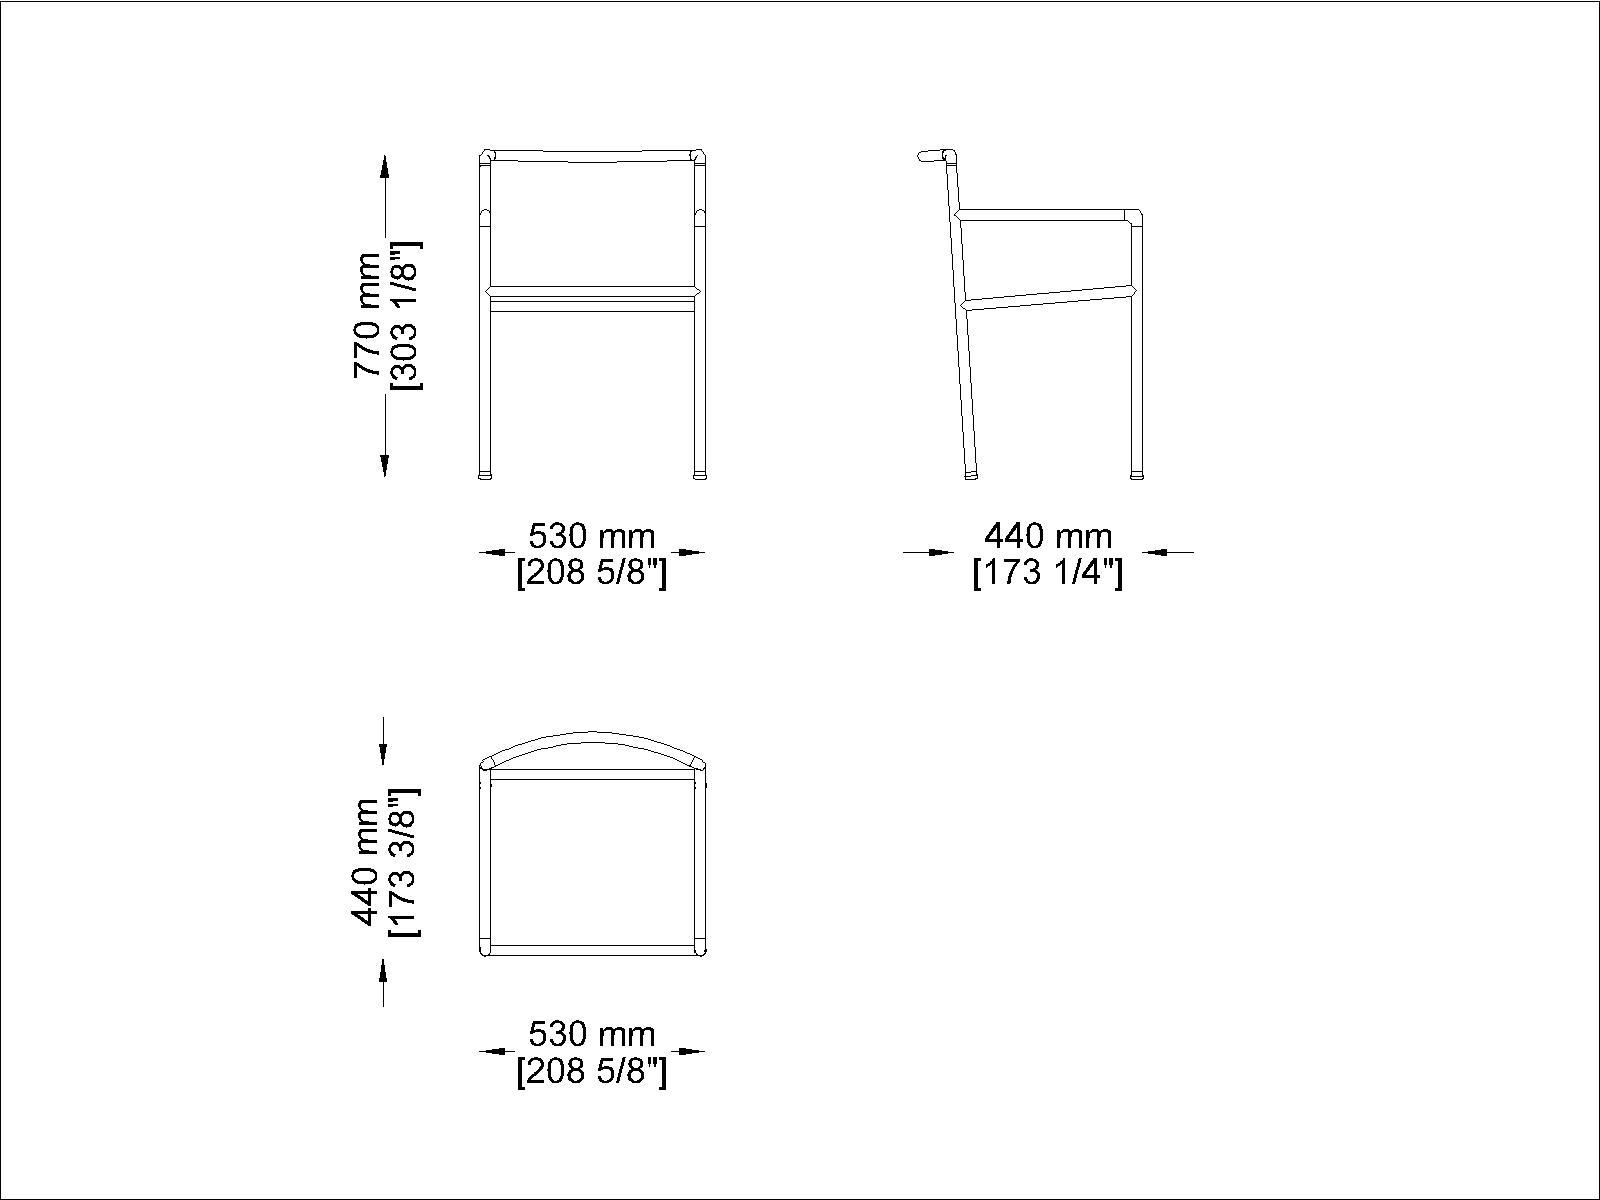 Coro Nest Stuhl PVC Geflecht 3 oder Acryl 6 mm Rahmen Edelstahl satiniert